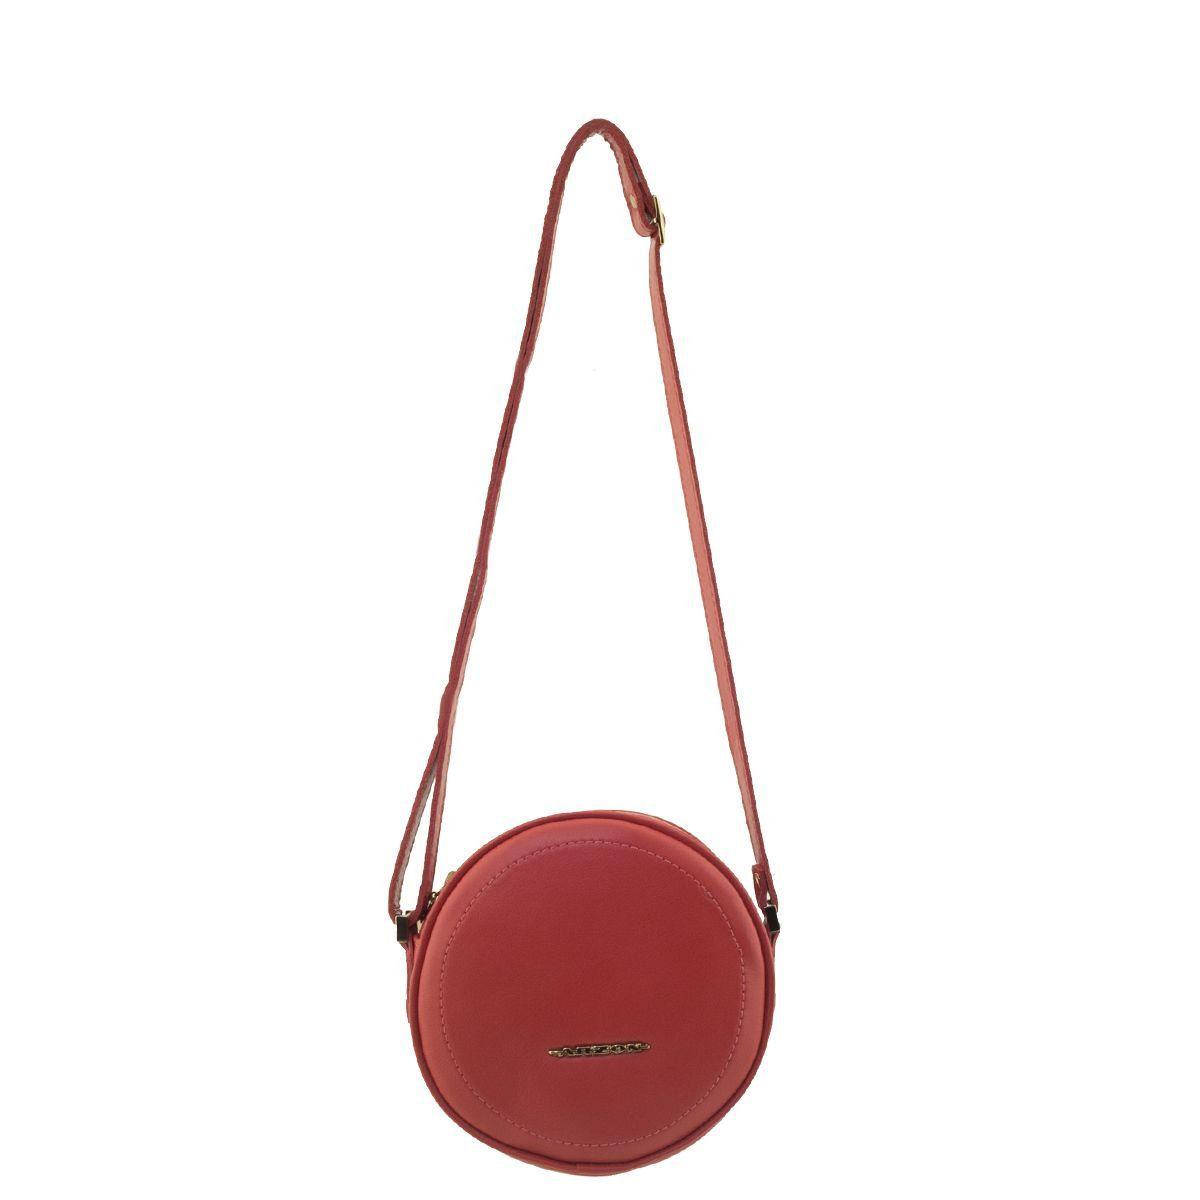 Bolsa Feminina Redonda Vermelha